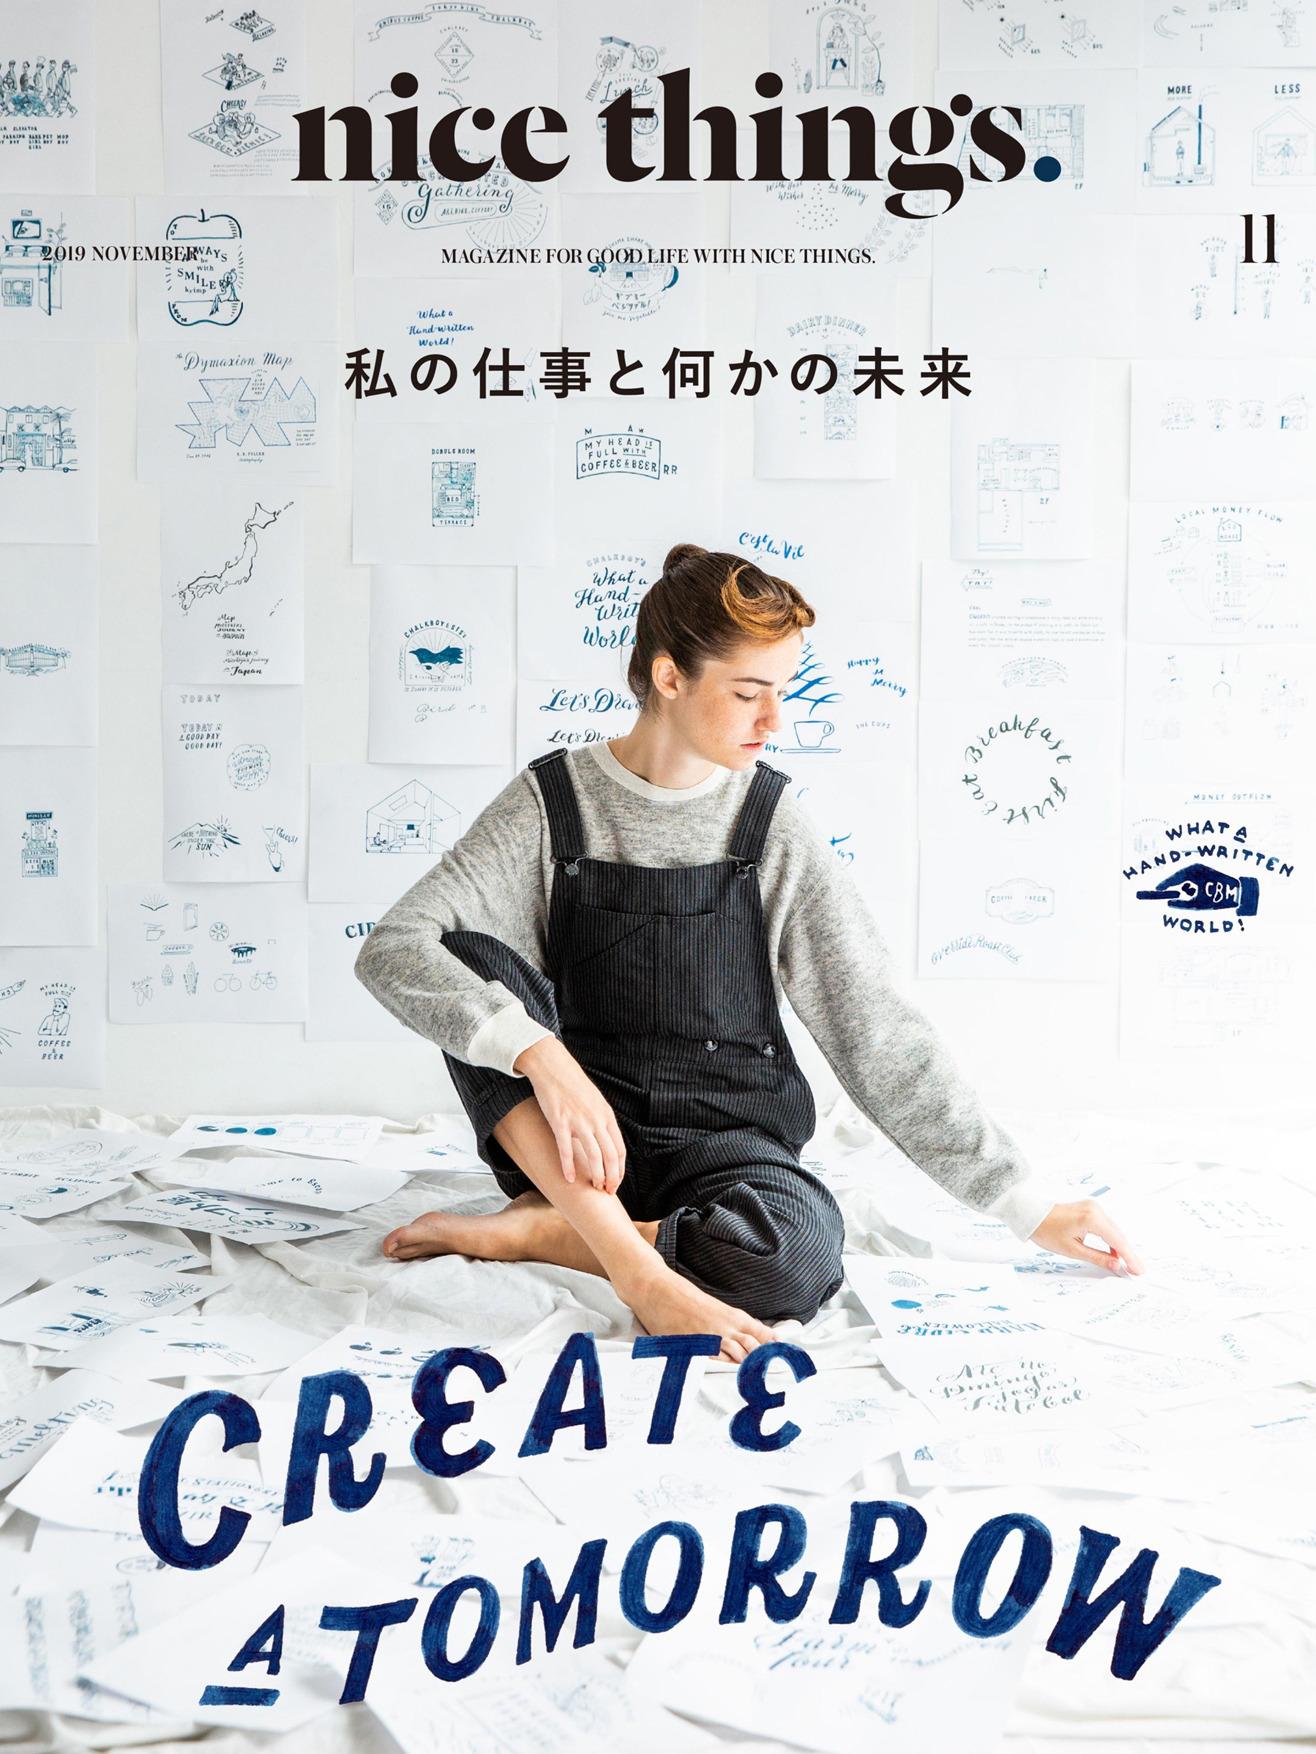 《nice things.》日本室内设计杂志2019年11月号